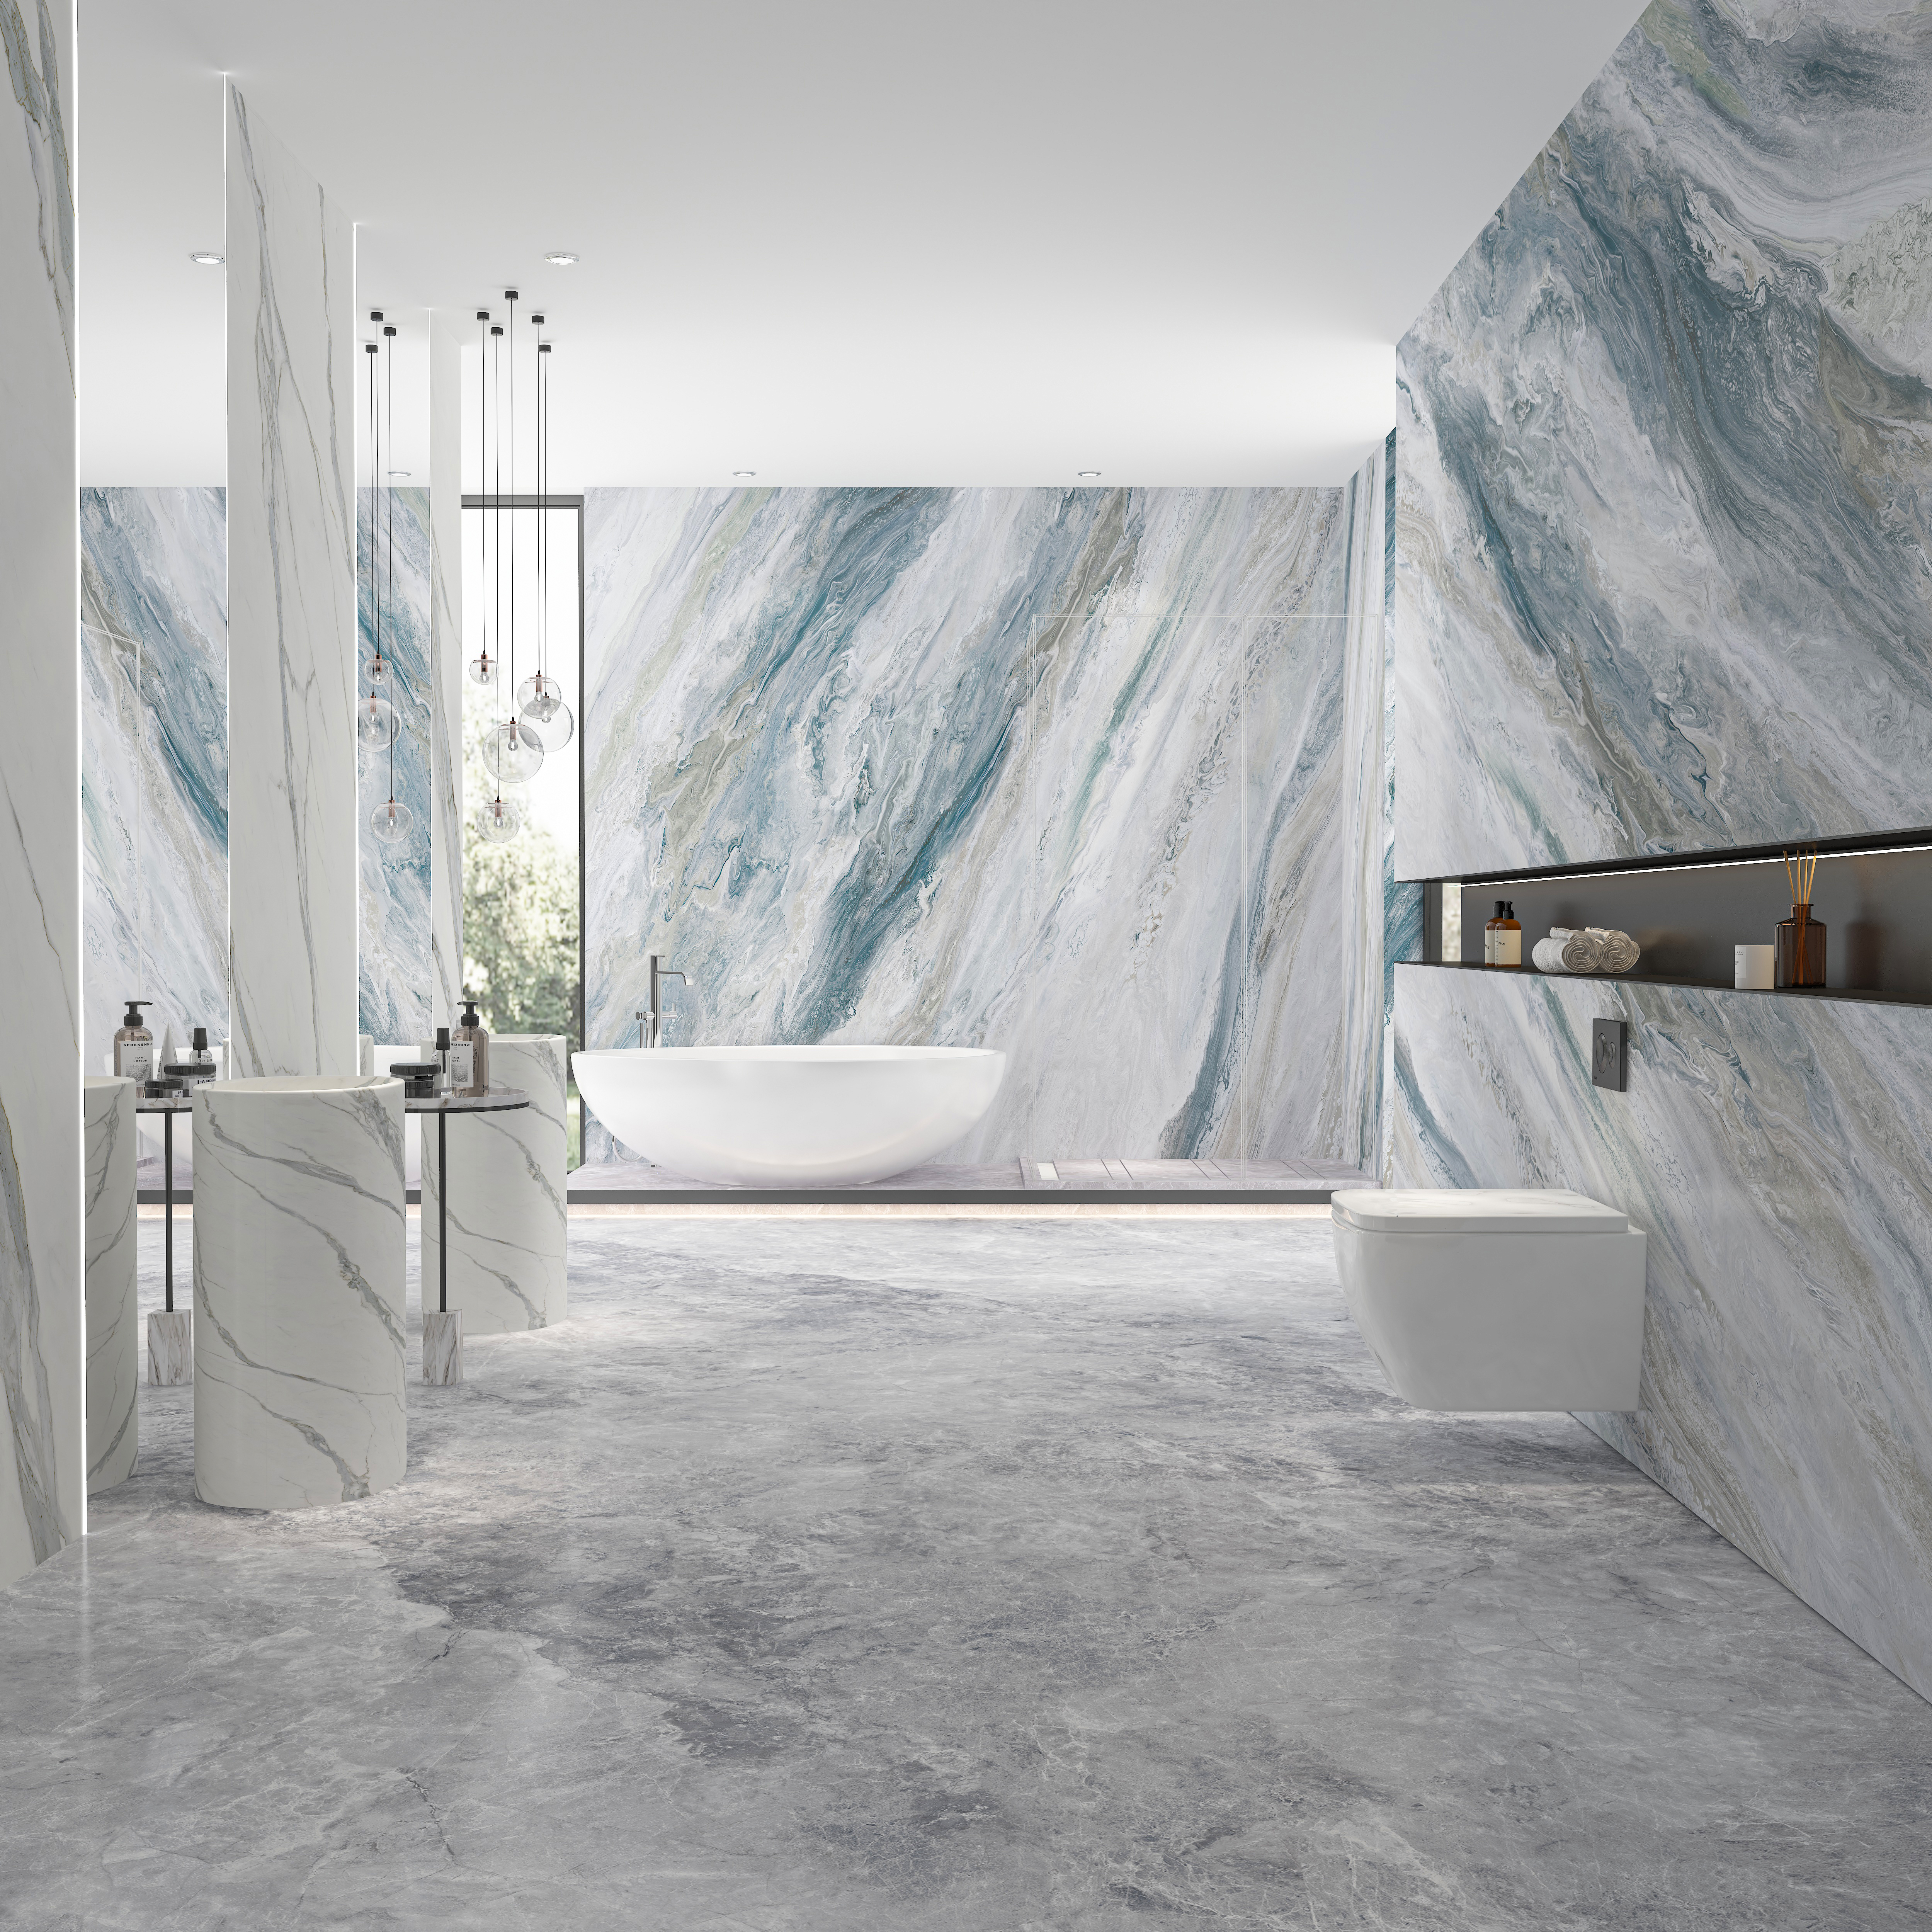 Locke Blue Grey Marble Tiles Manufacturers, Locke Blue Grey Marble Tiles Factory, Supply Locke Blue Grey Marble Tiles